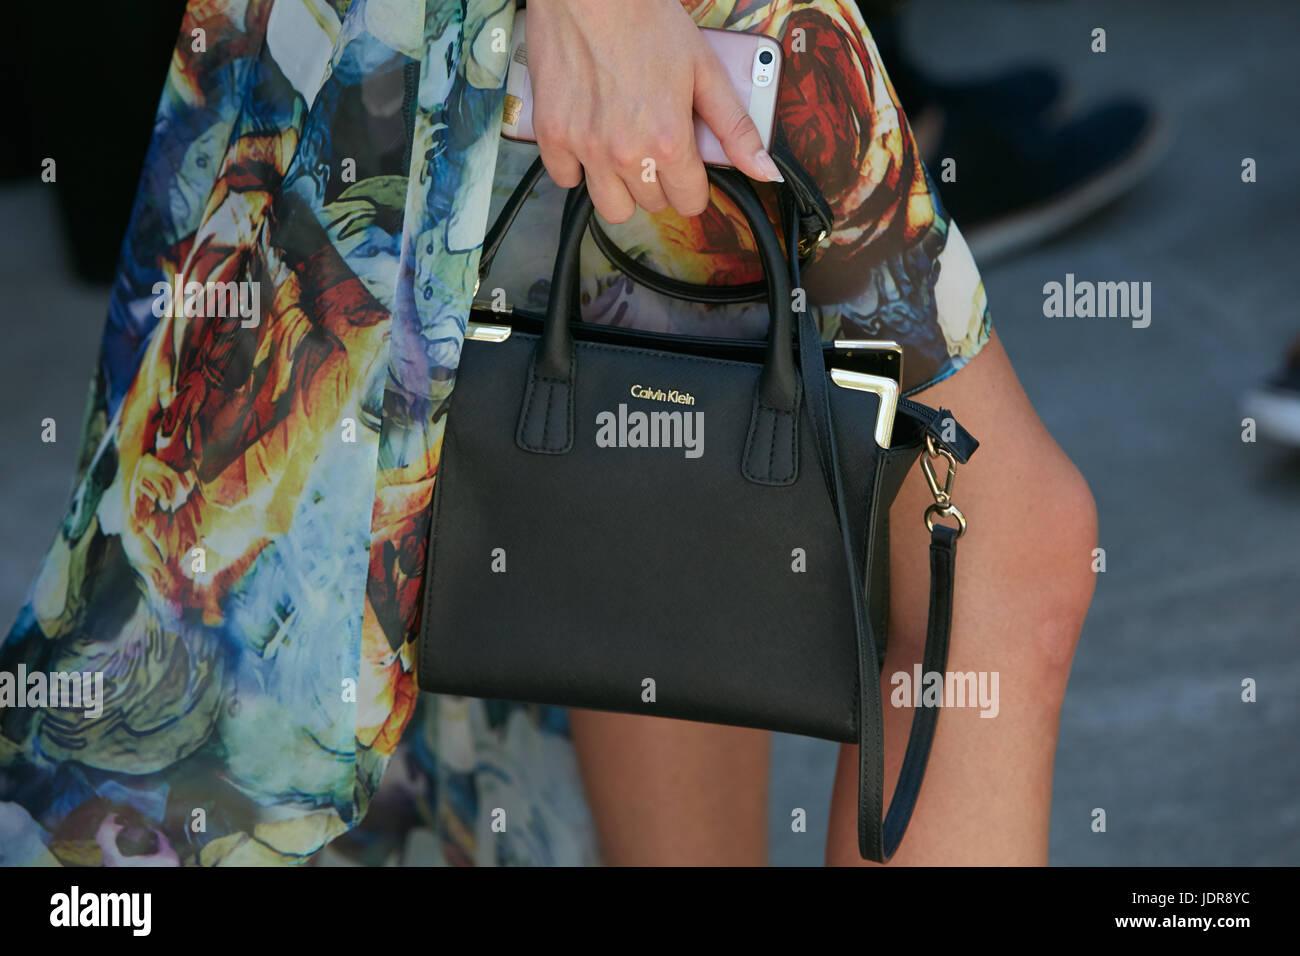 MILAN JUNE 19: Woman with black leather Calvin Klein bag